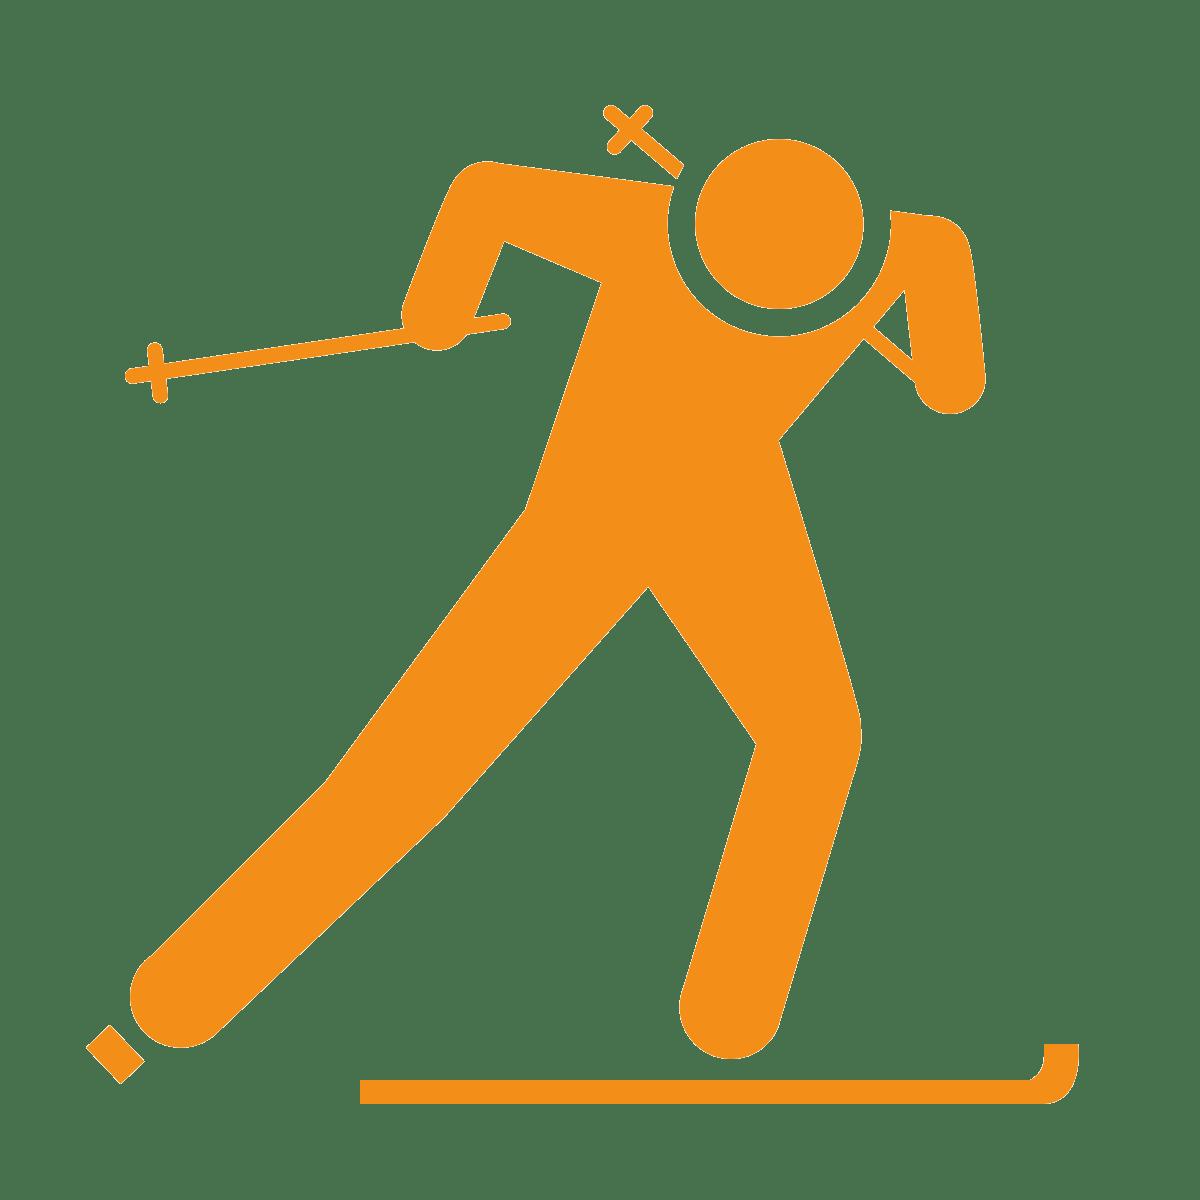 Cross country skis clipart clipart black and white CSU Coaches – CSU Juniors Nordic Ski Team clipart black and white